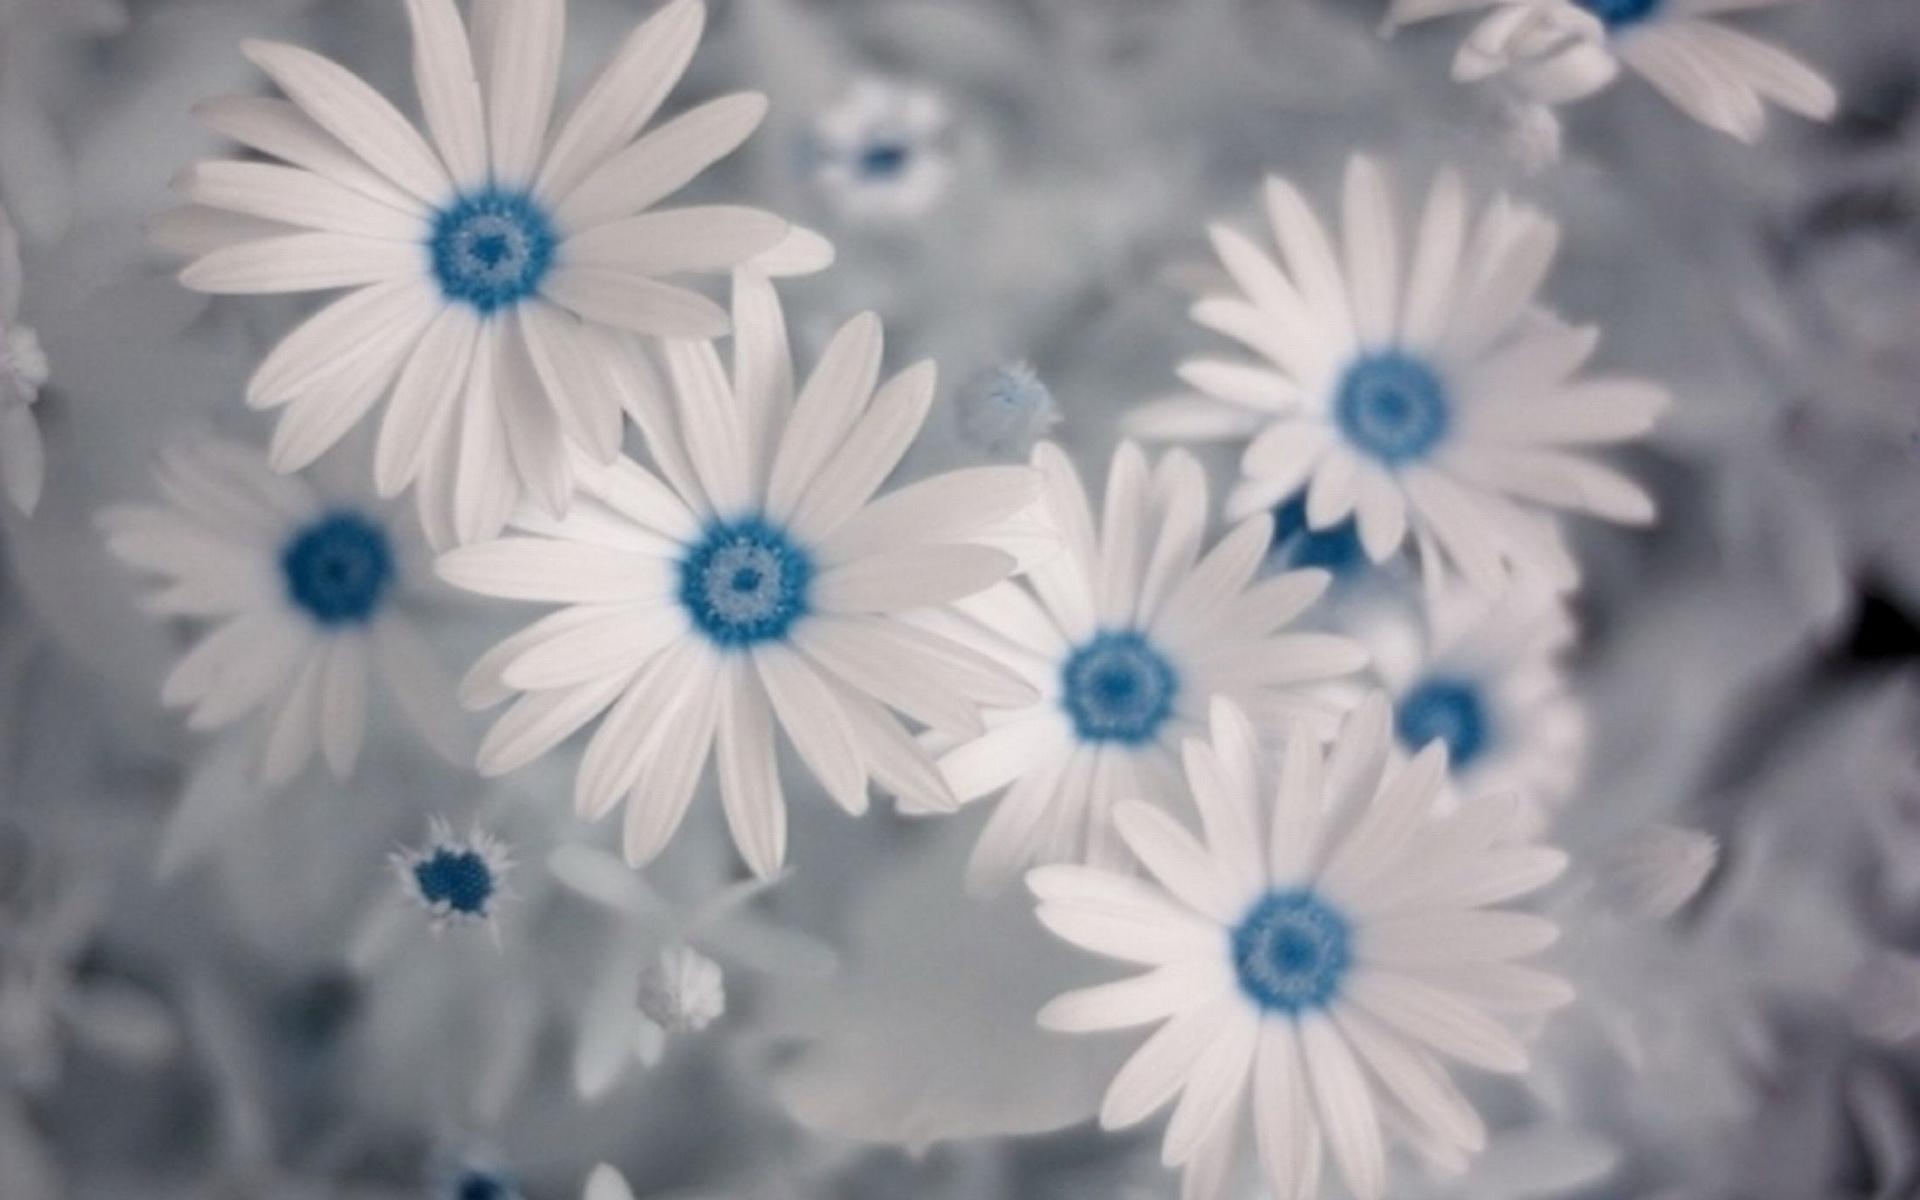 hinh anh hoa cuc dep 8